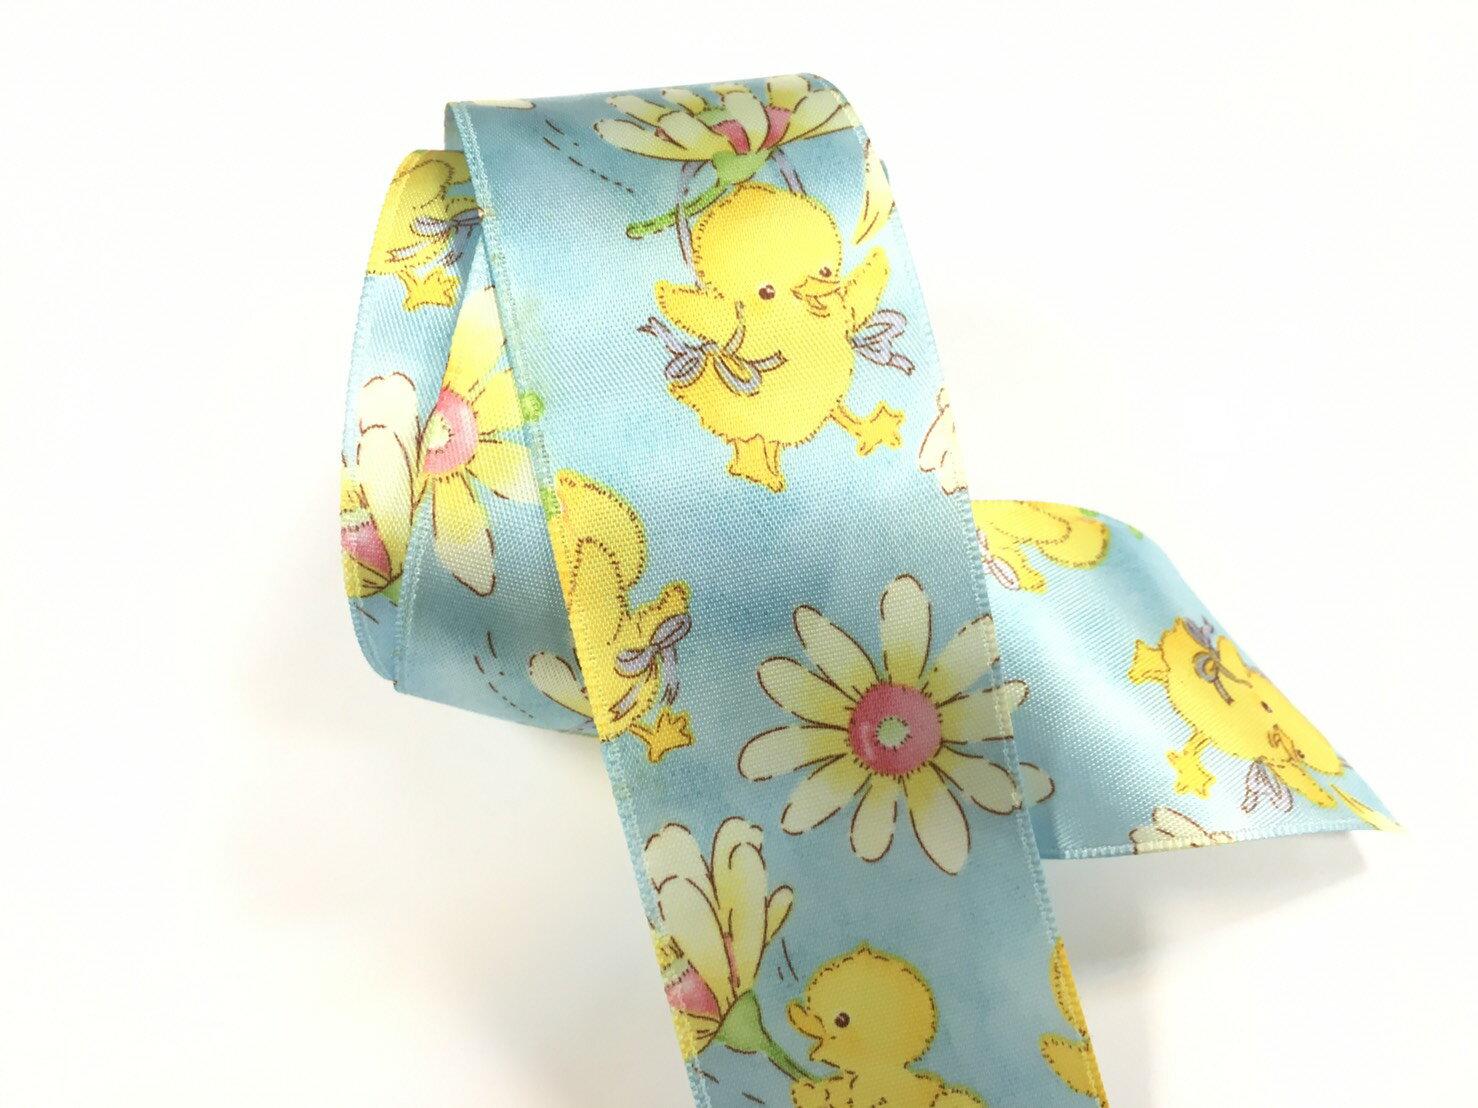 【Crystal Rose緞帶專賣店】黃色小雞單面緞緞帶 38mm 3碼 (4色) 0